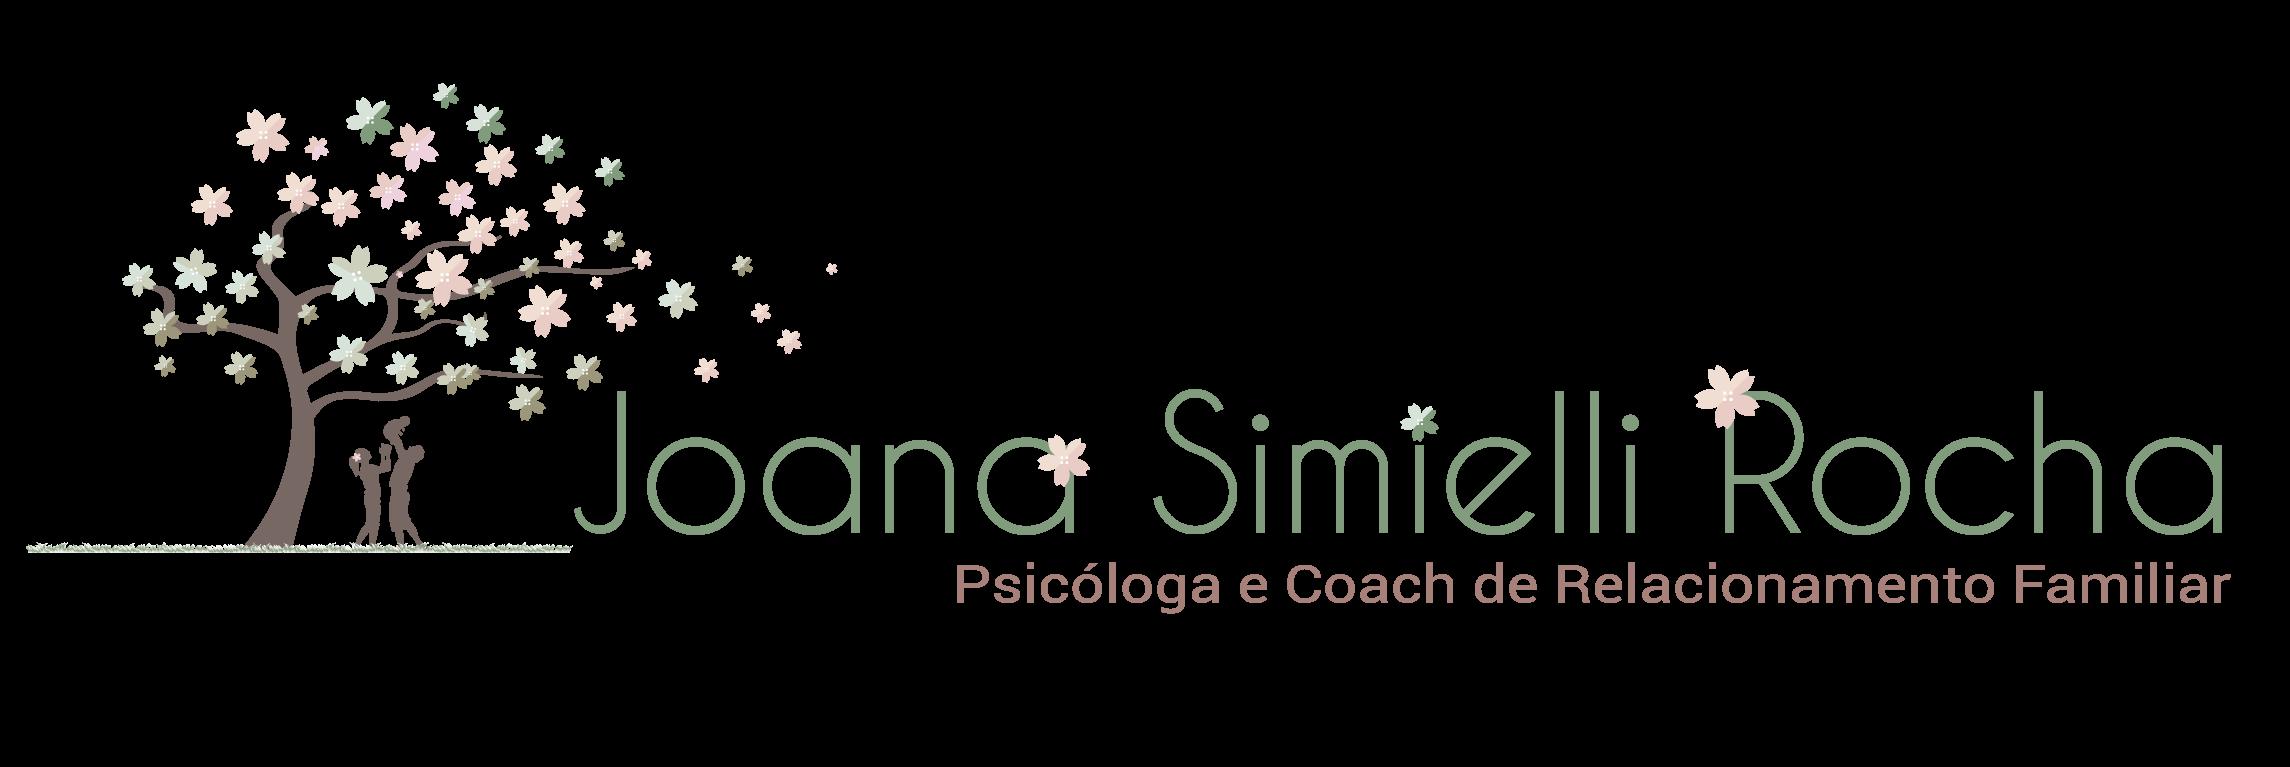 Joana Simielli